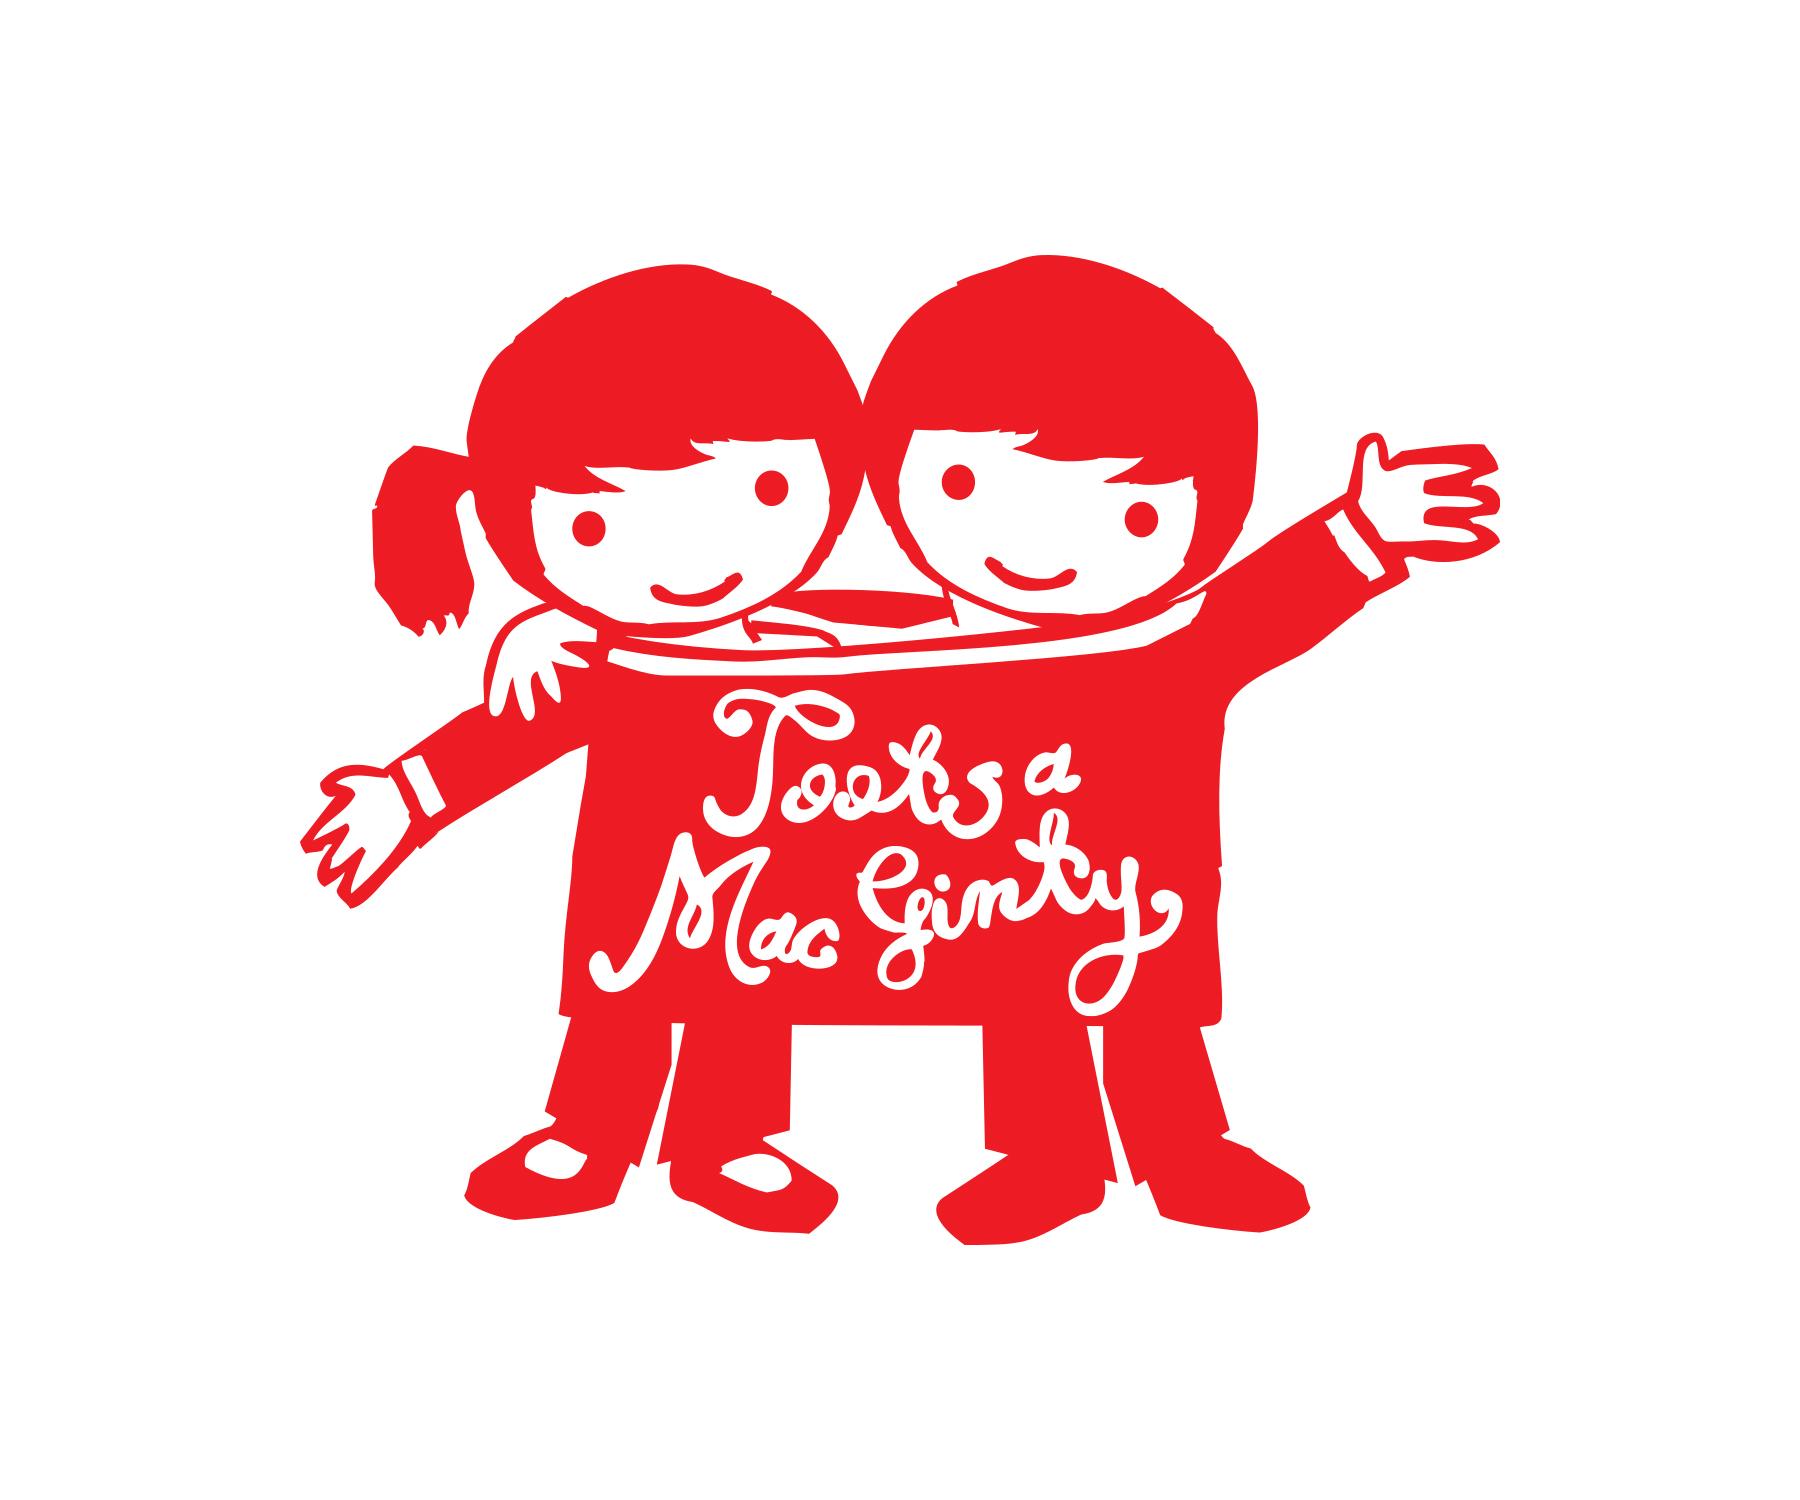 Award-winning, unisex childrenswear brand Tootsa MacGinty acquired by Inc Retail